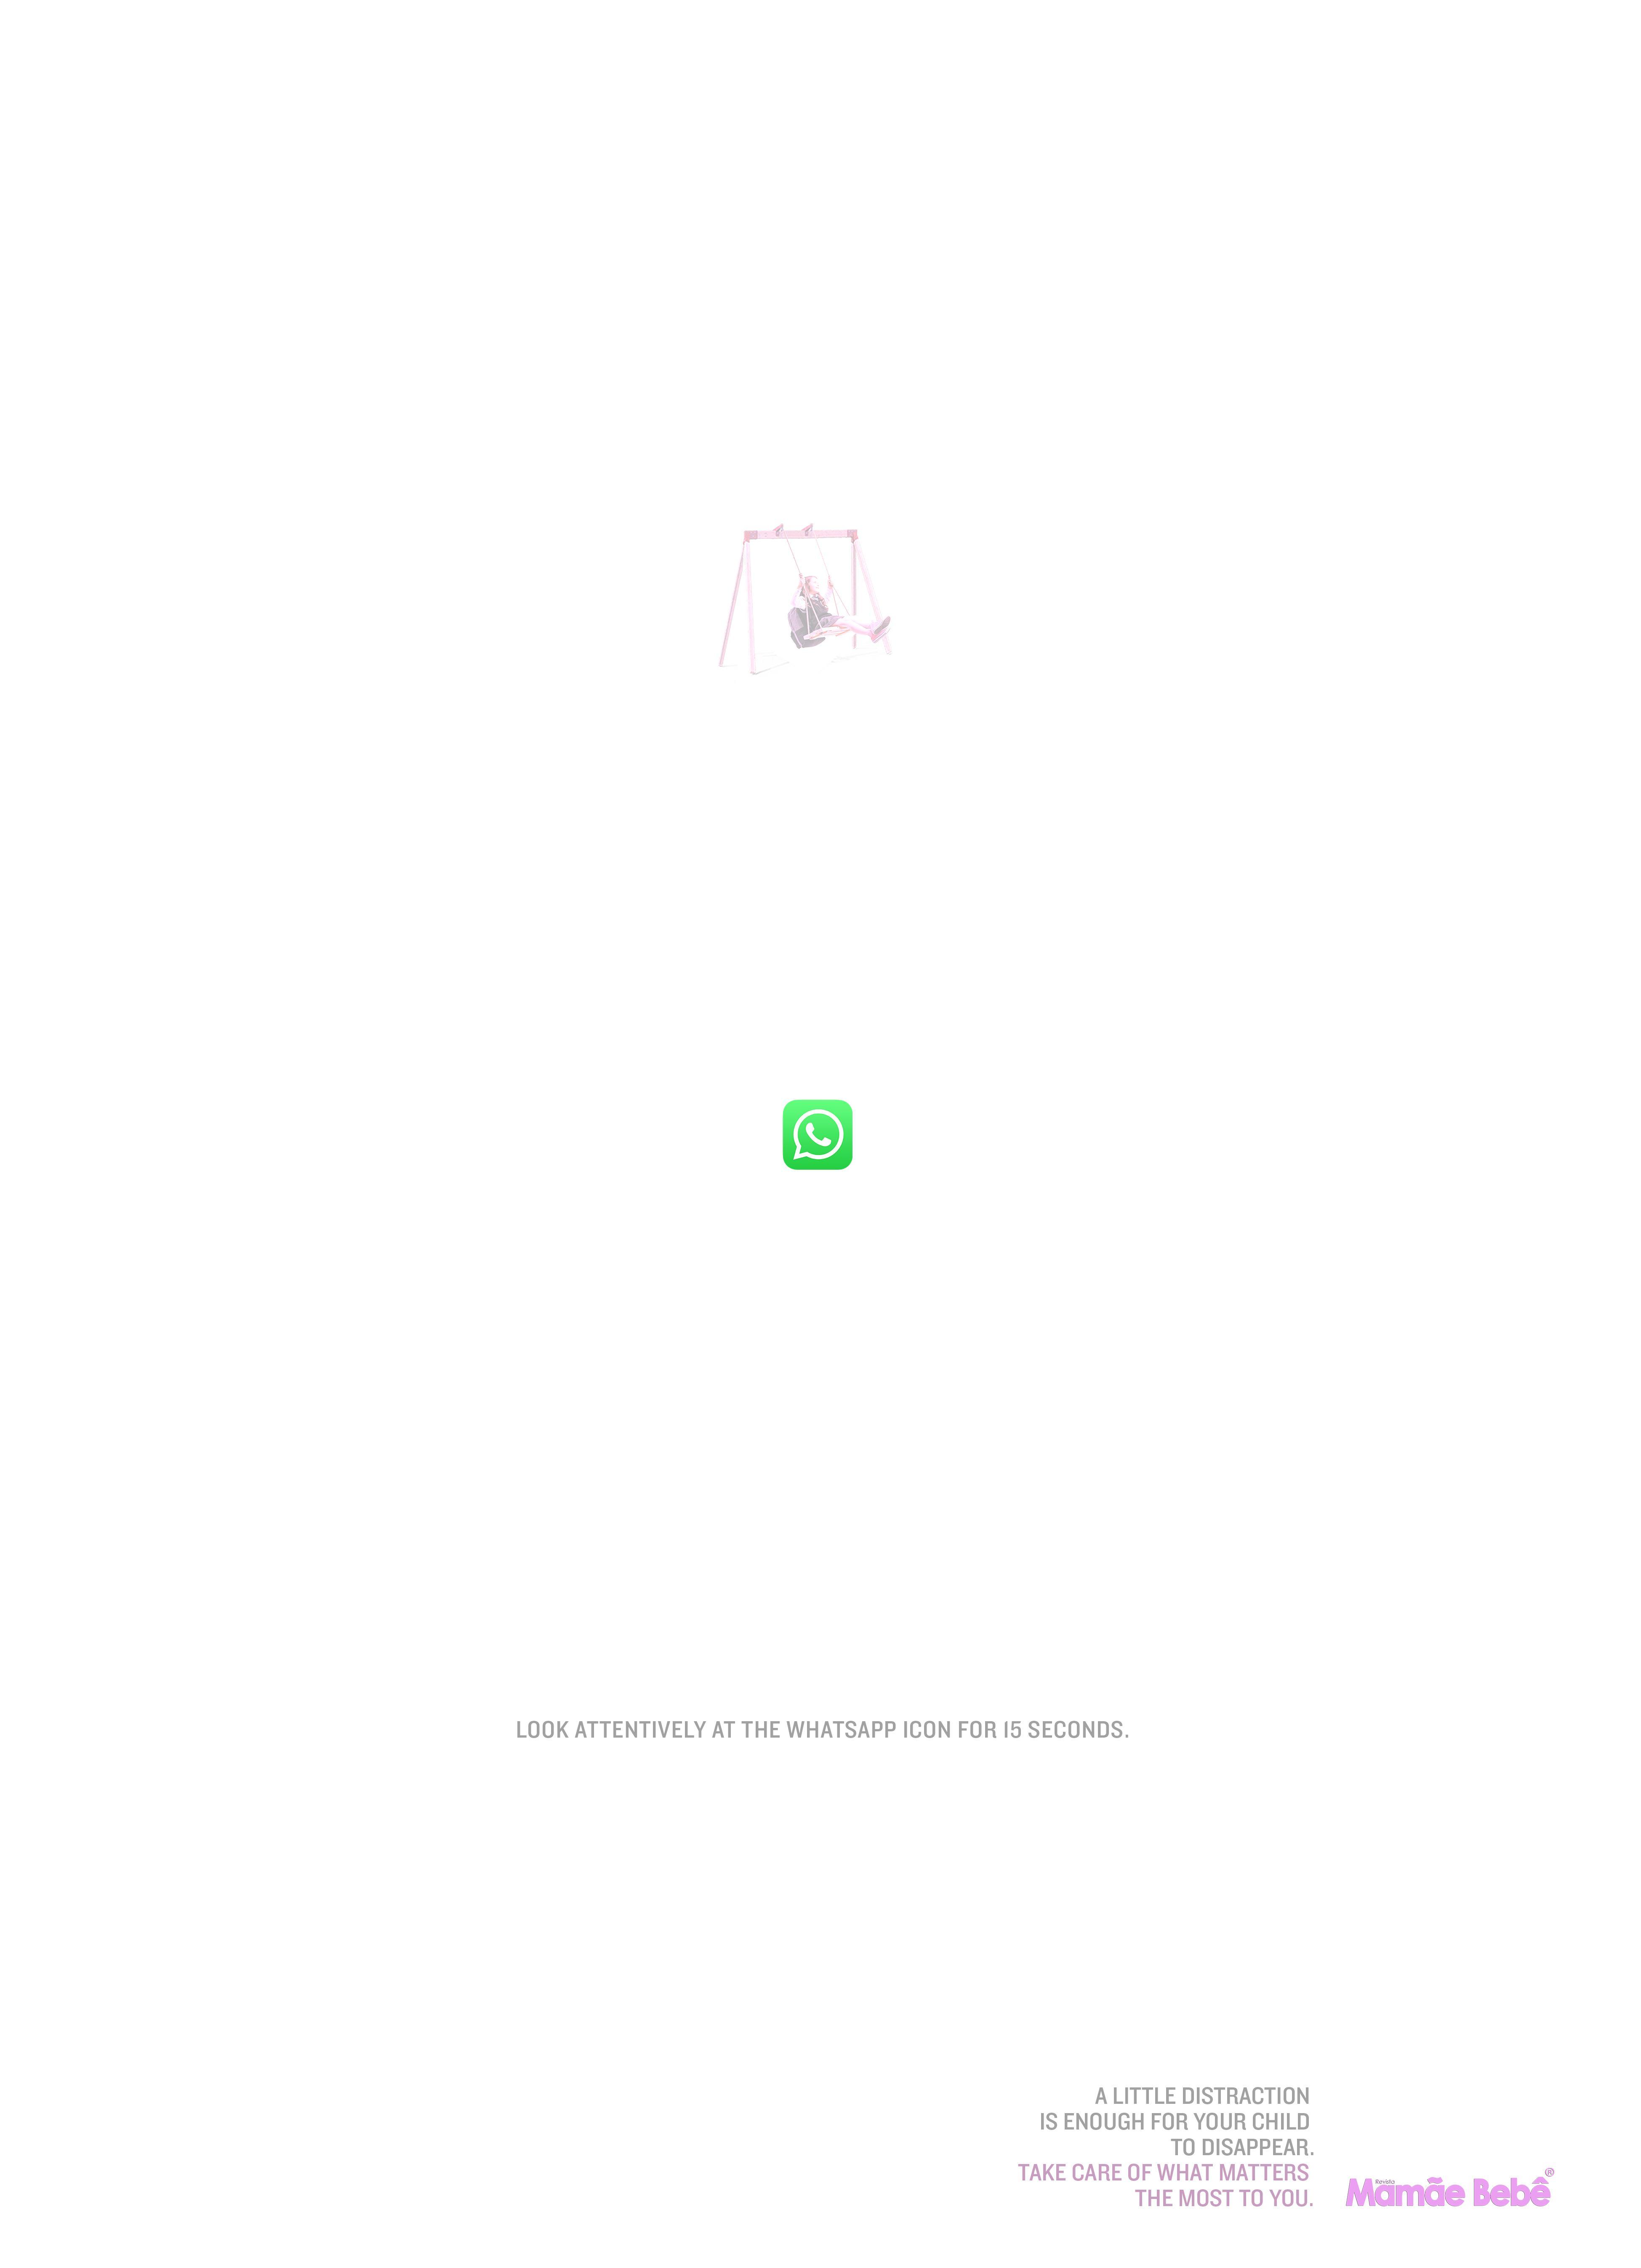 Revista Mamãe Bebê Print Ad - Optical Illusion, 3